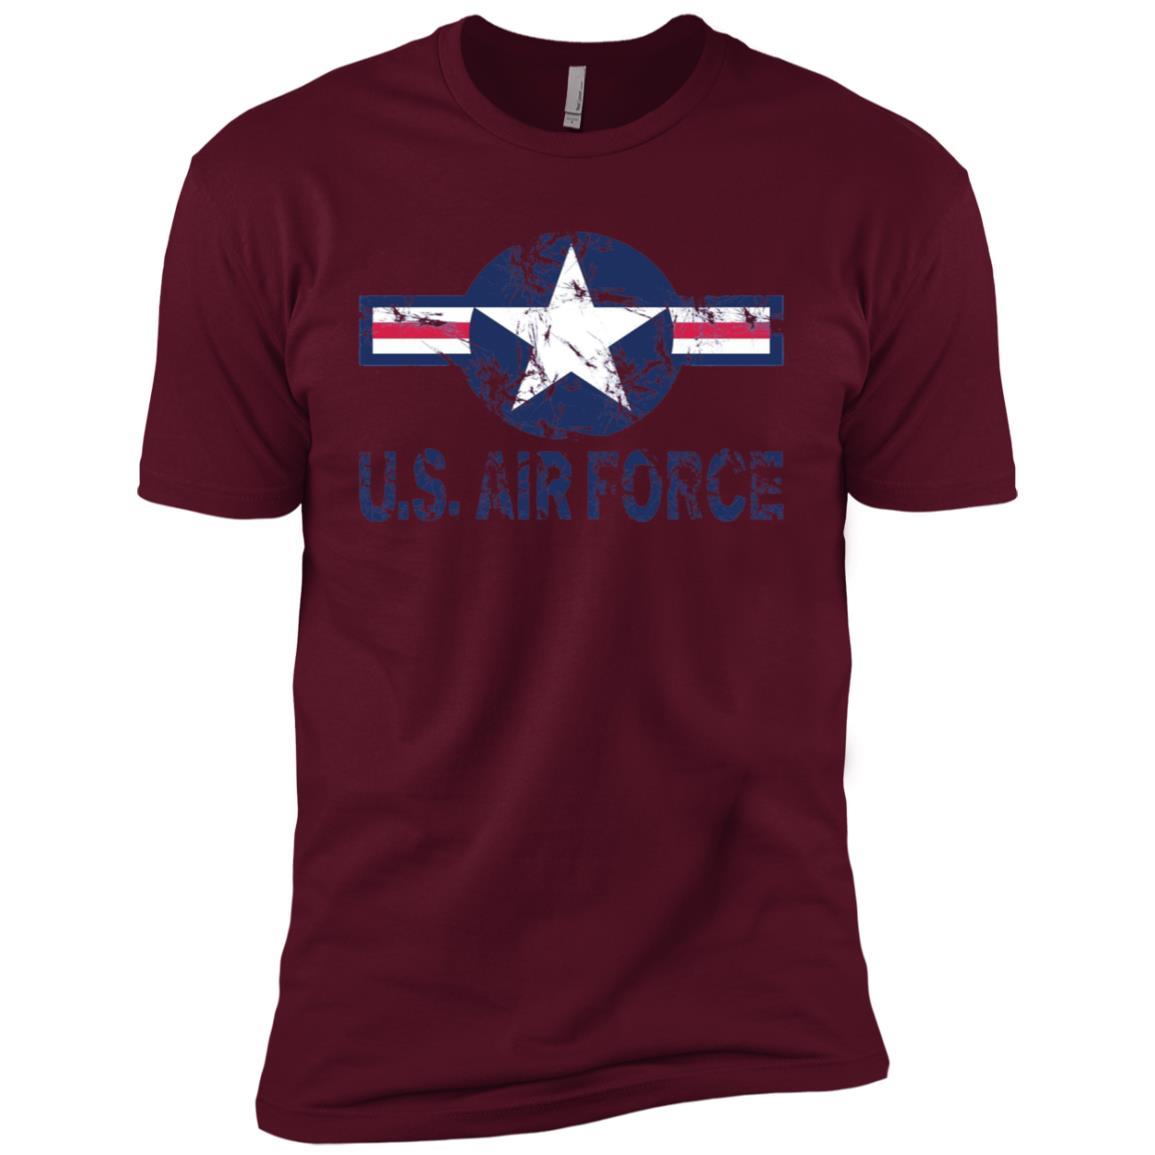 U.S. Air Force Original USAF T-SHIRT Men Short Sleeve T-Shirt